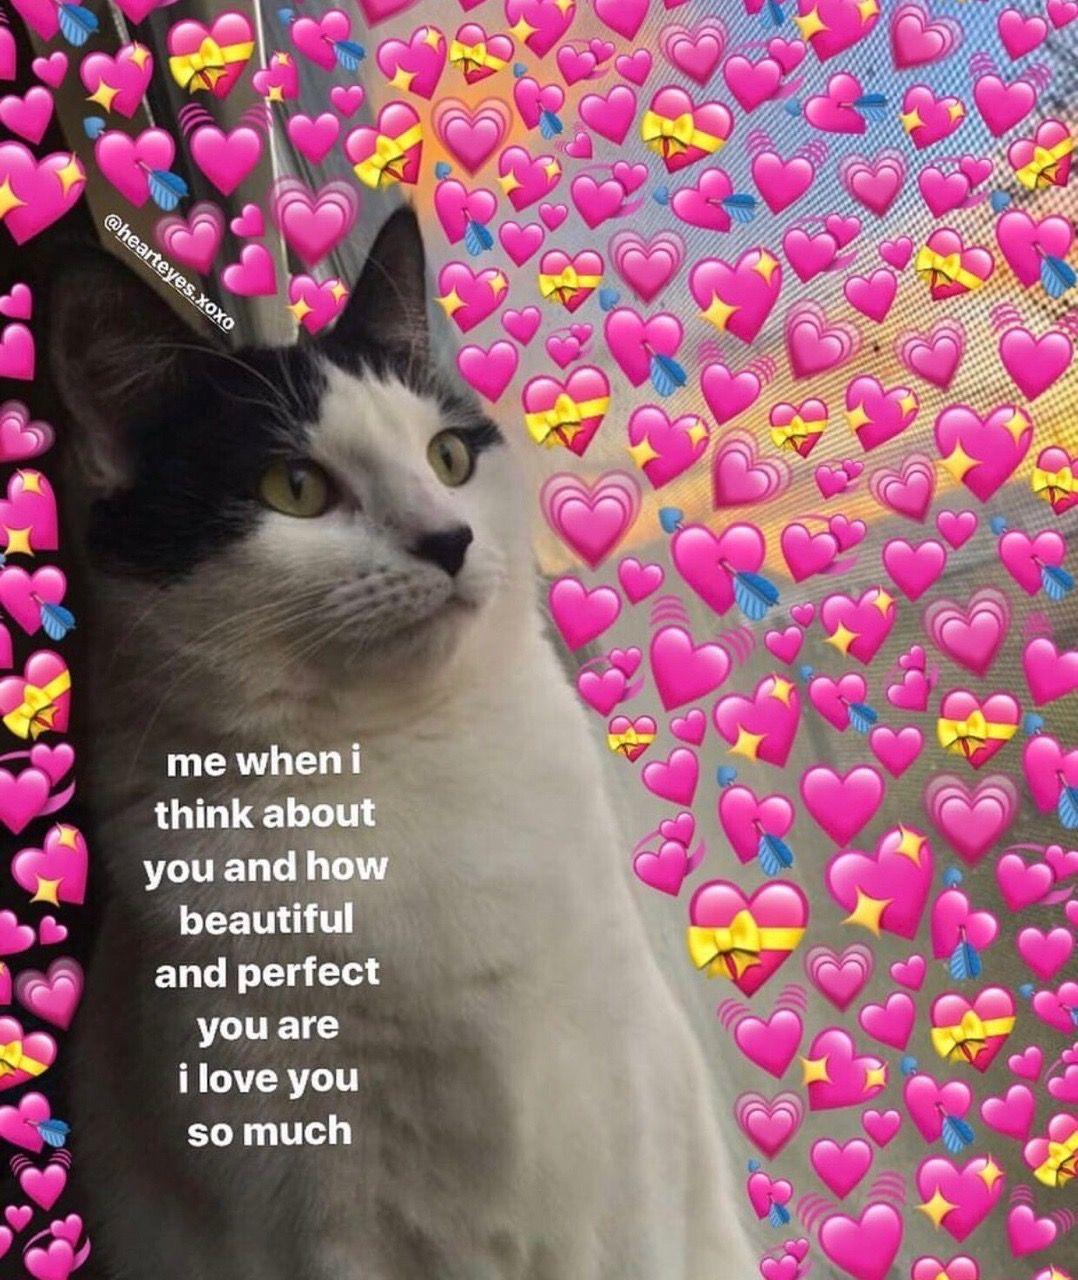 Qxeennn Heartmemes Pinterest Love Memes Memes And Wholesome